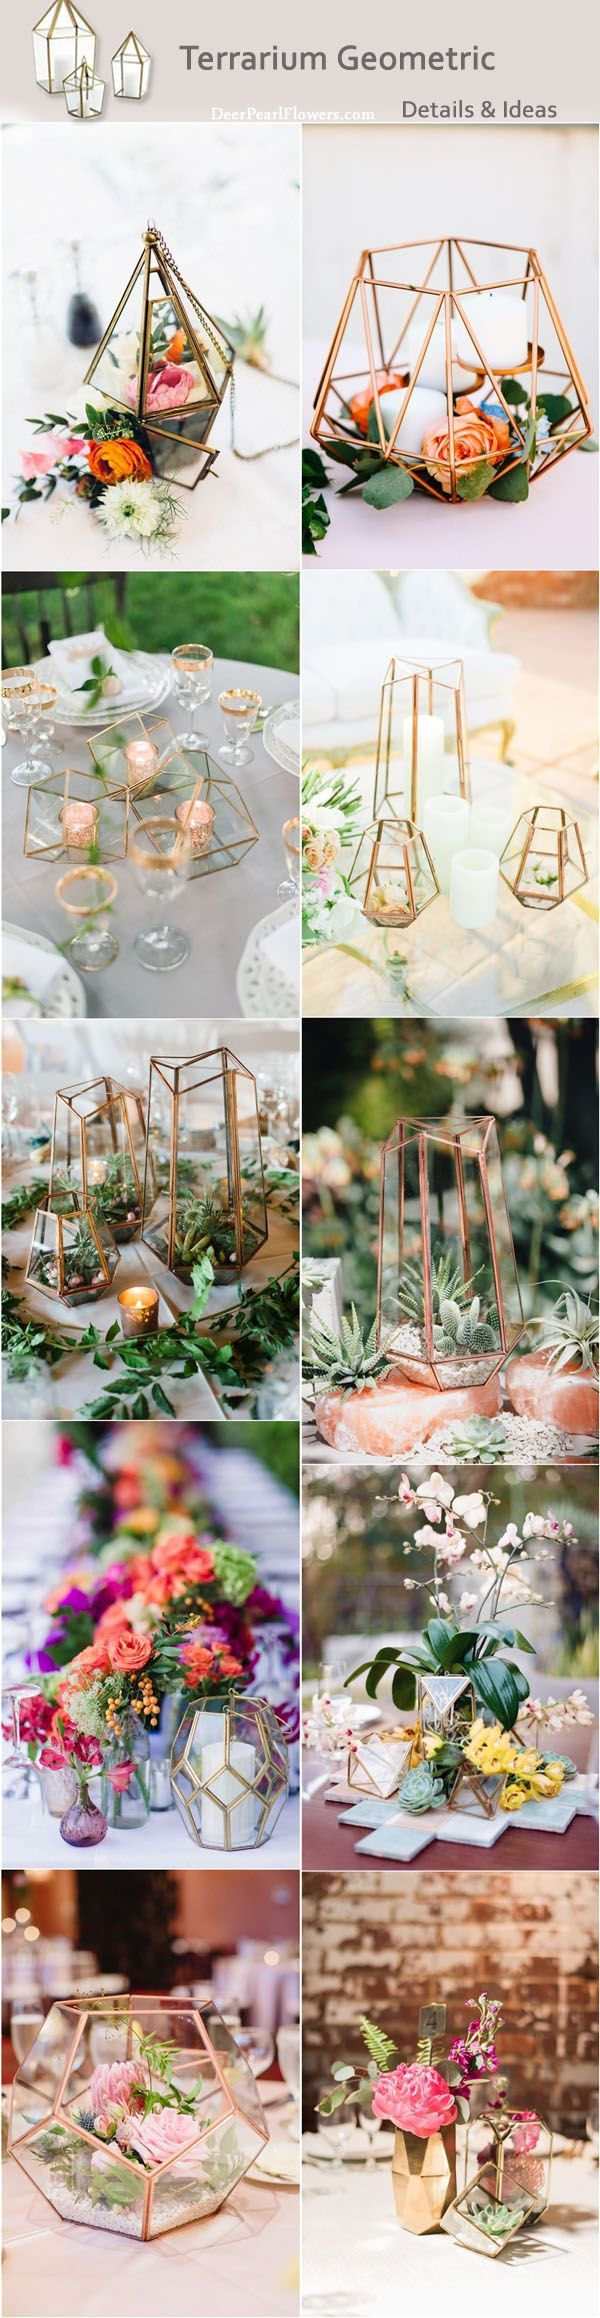 best fantasy wedding images on pinterest wedding ideas